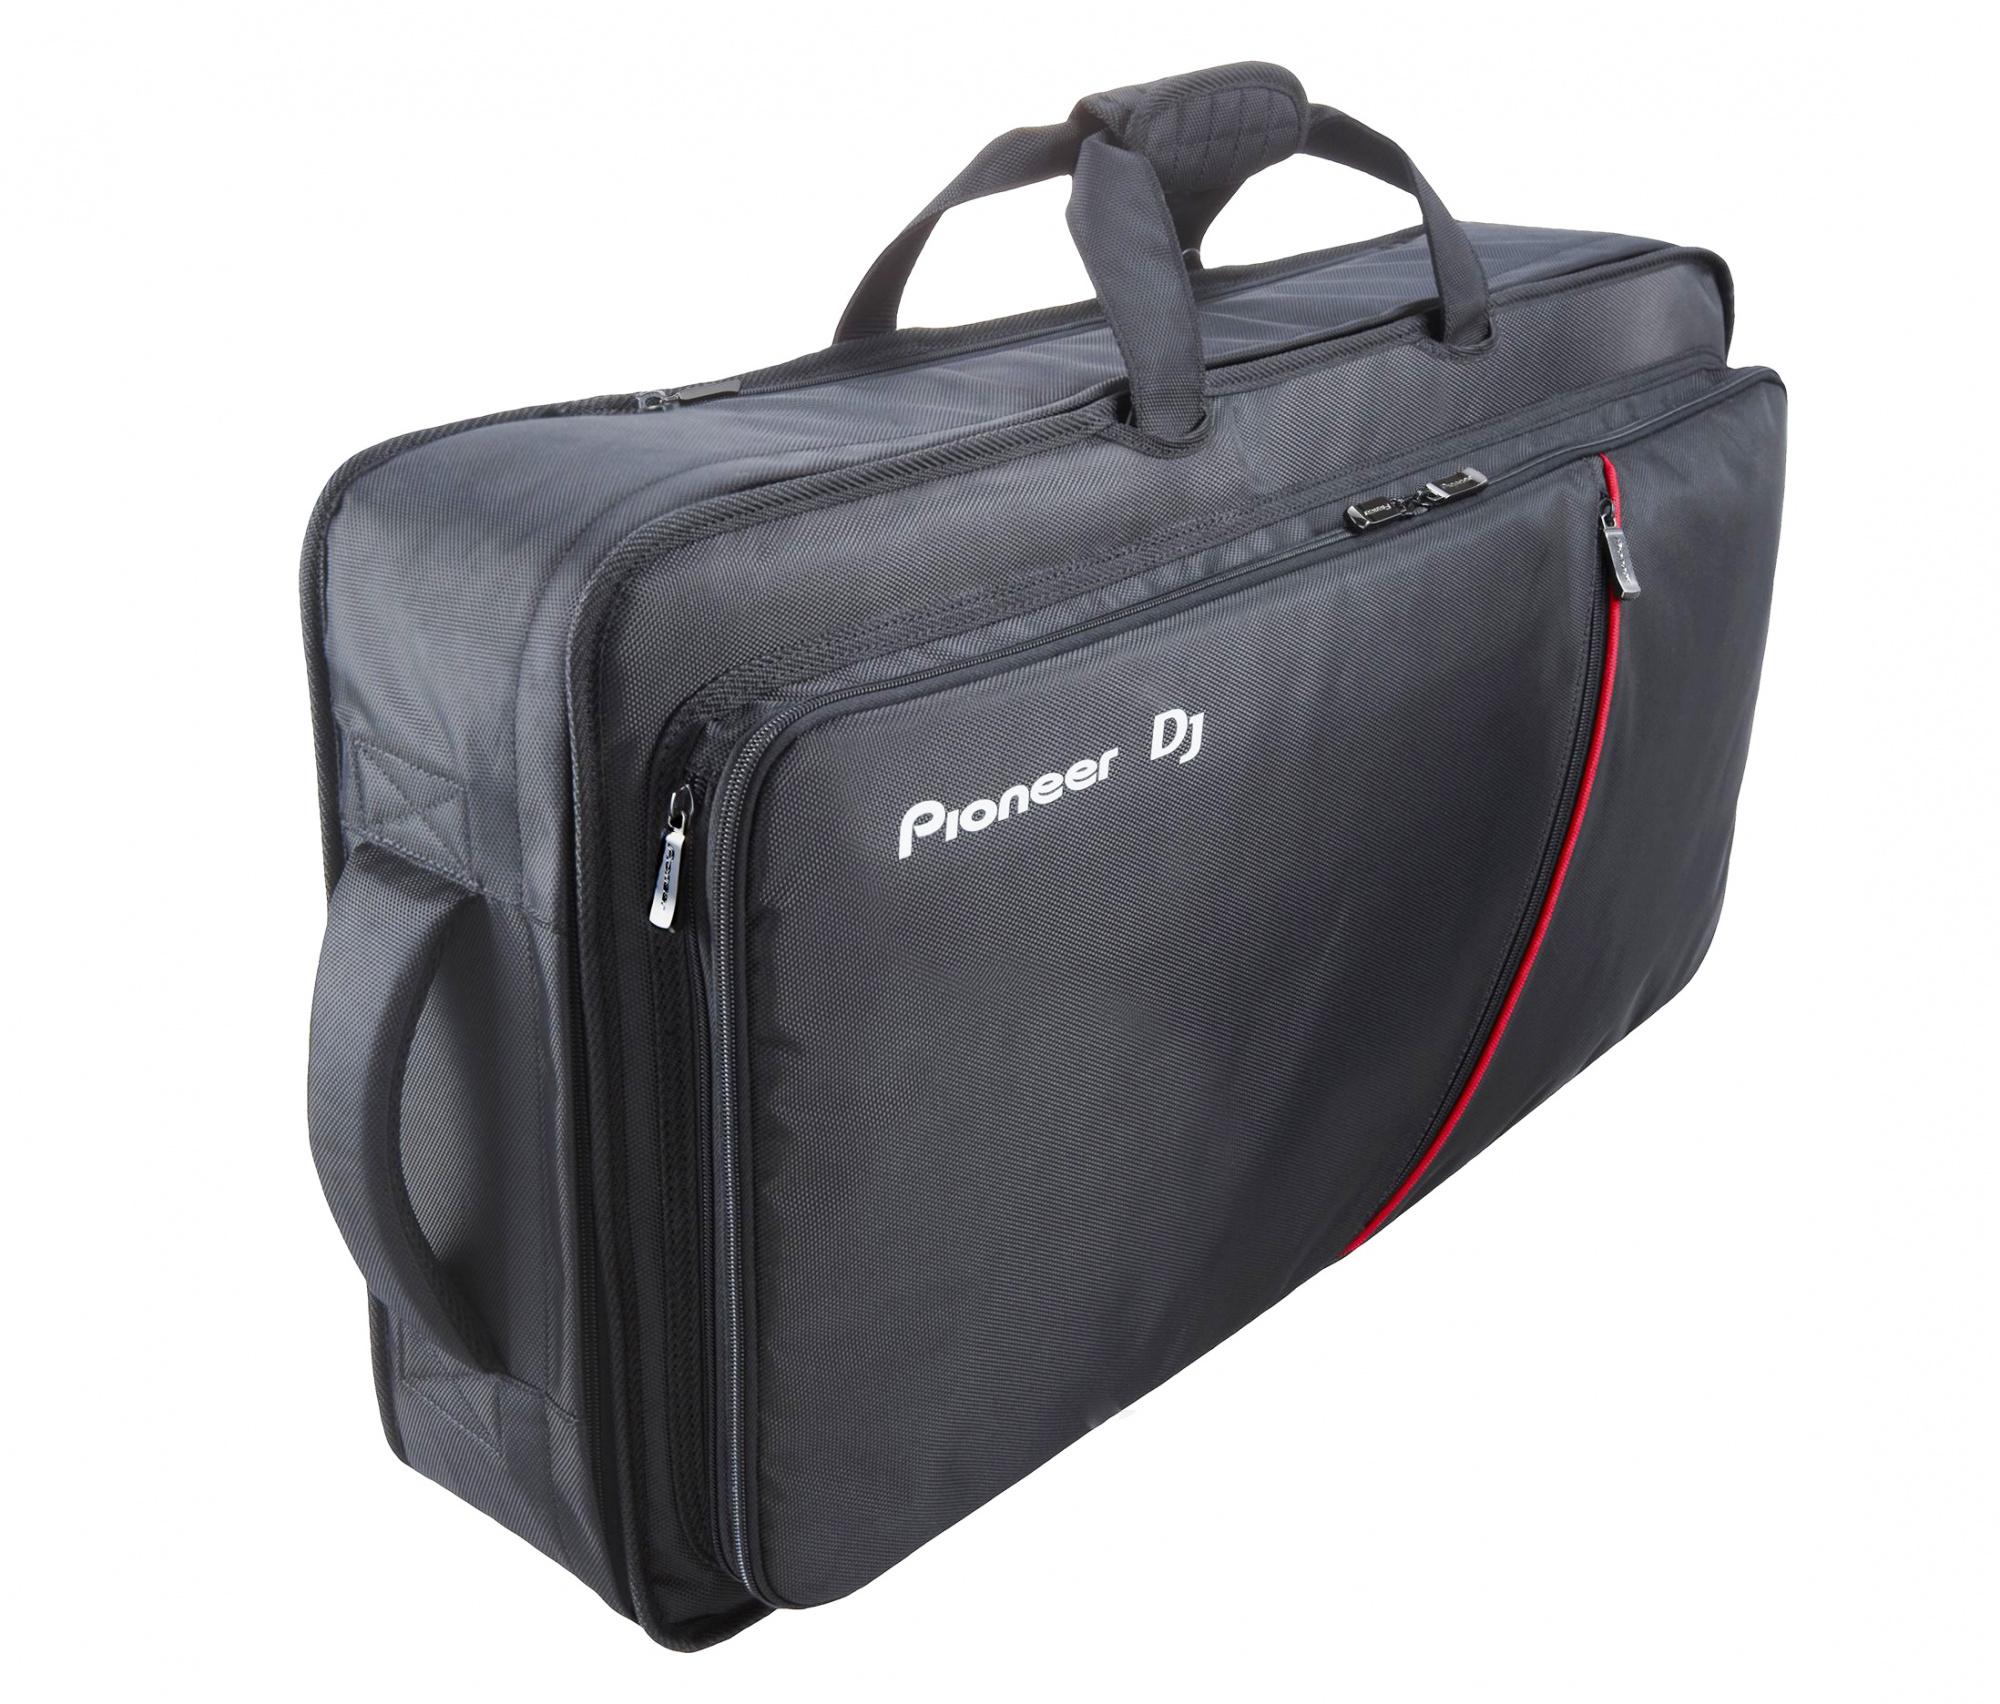 Pioneer DJC-SC5 - сумка для контроллера DDJ-SX/DDJ-S1/DDJ-T1 (Black) от iCover